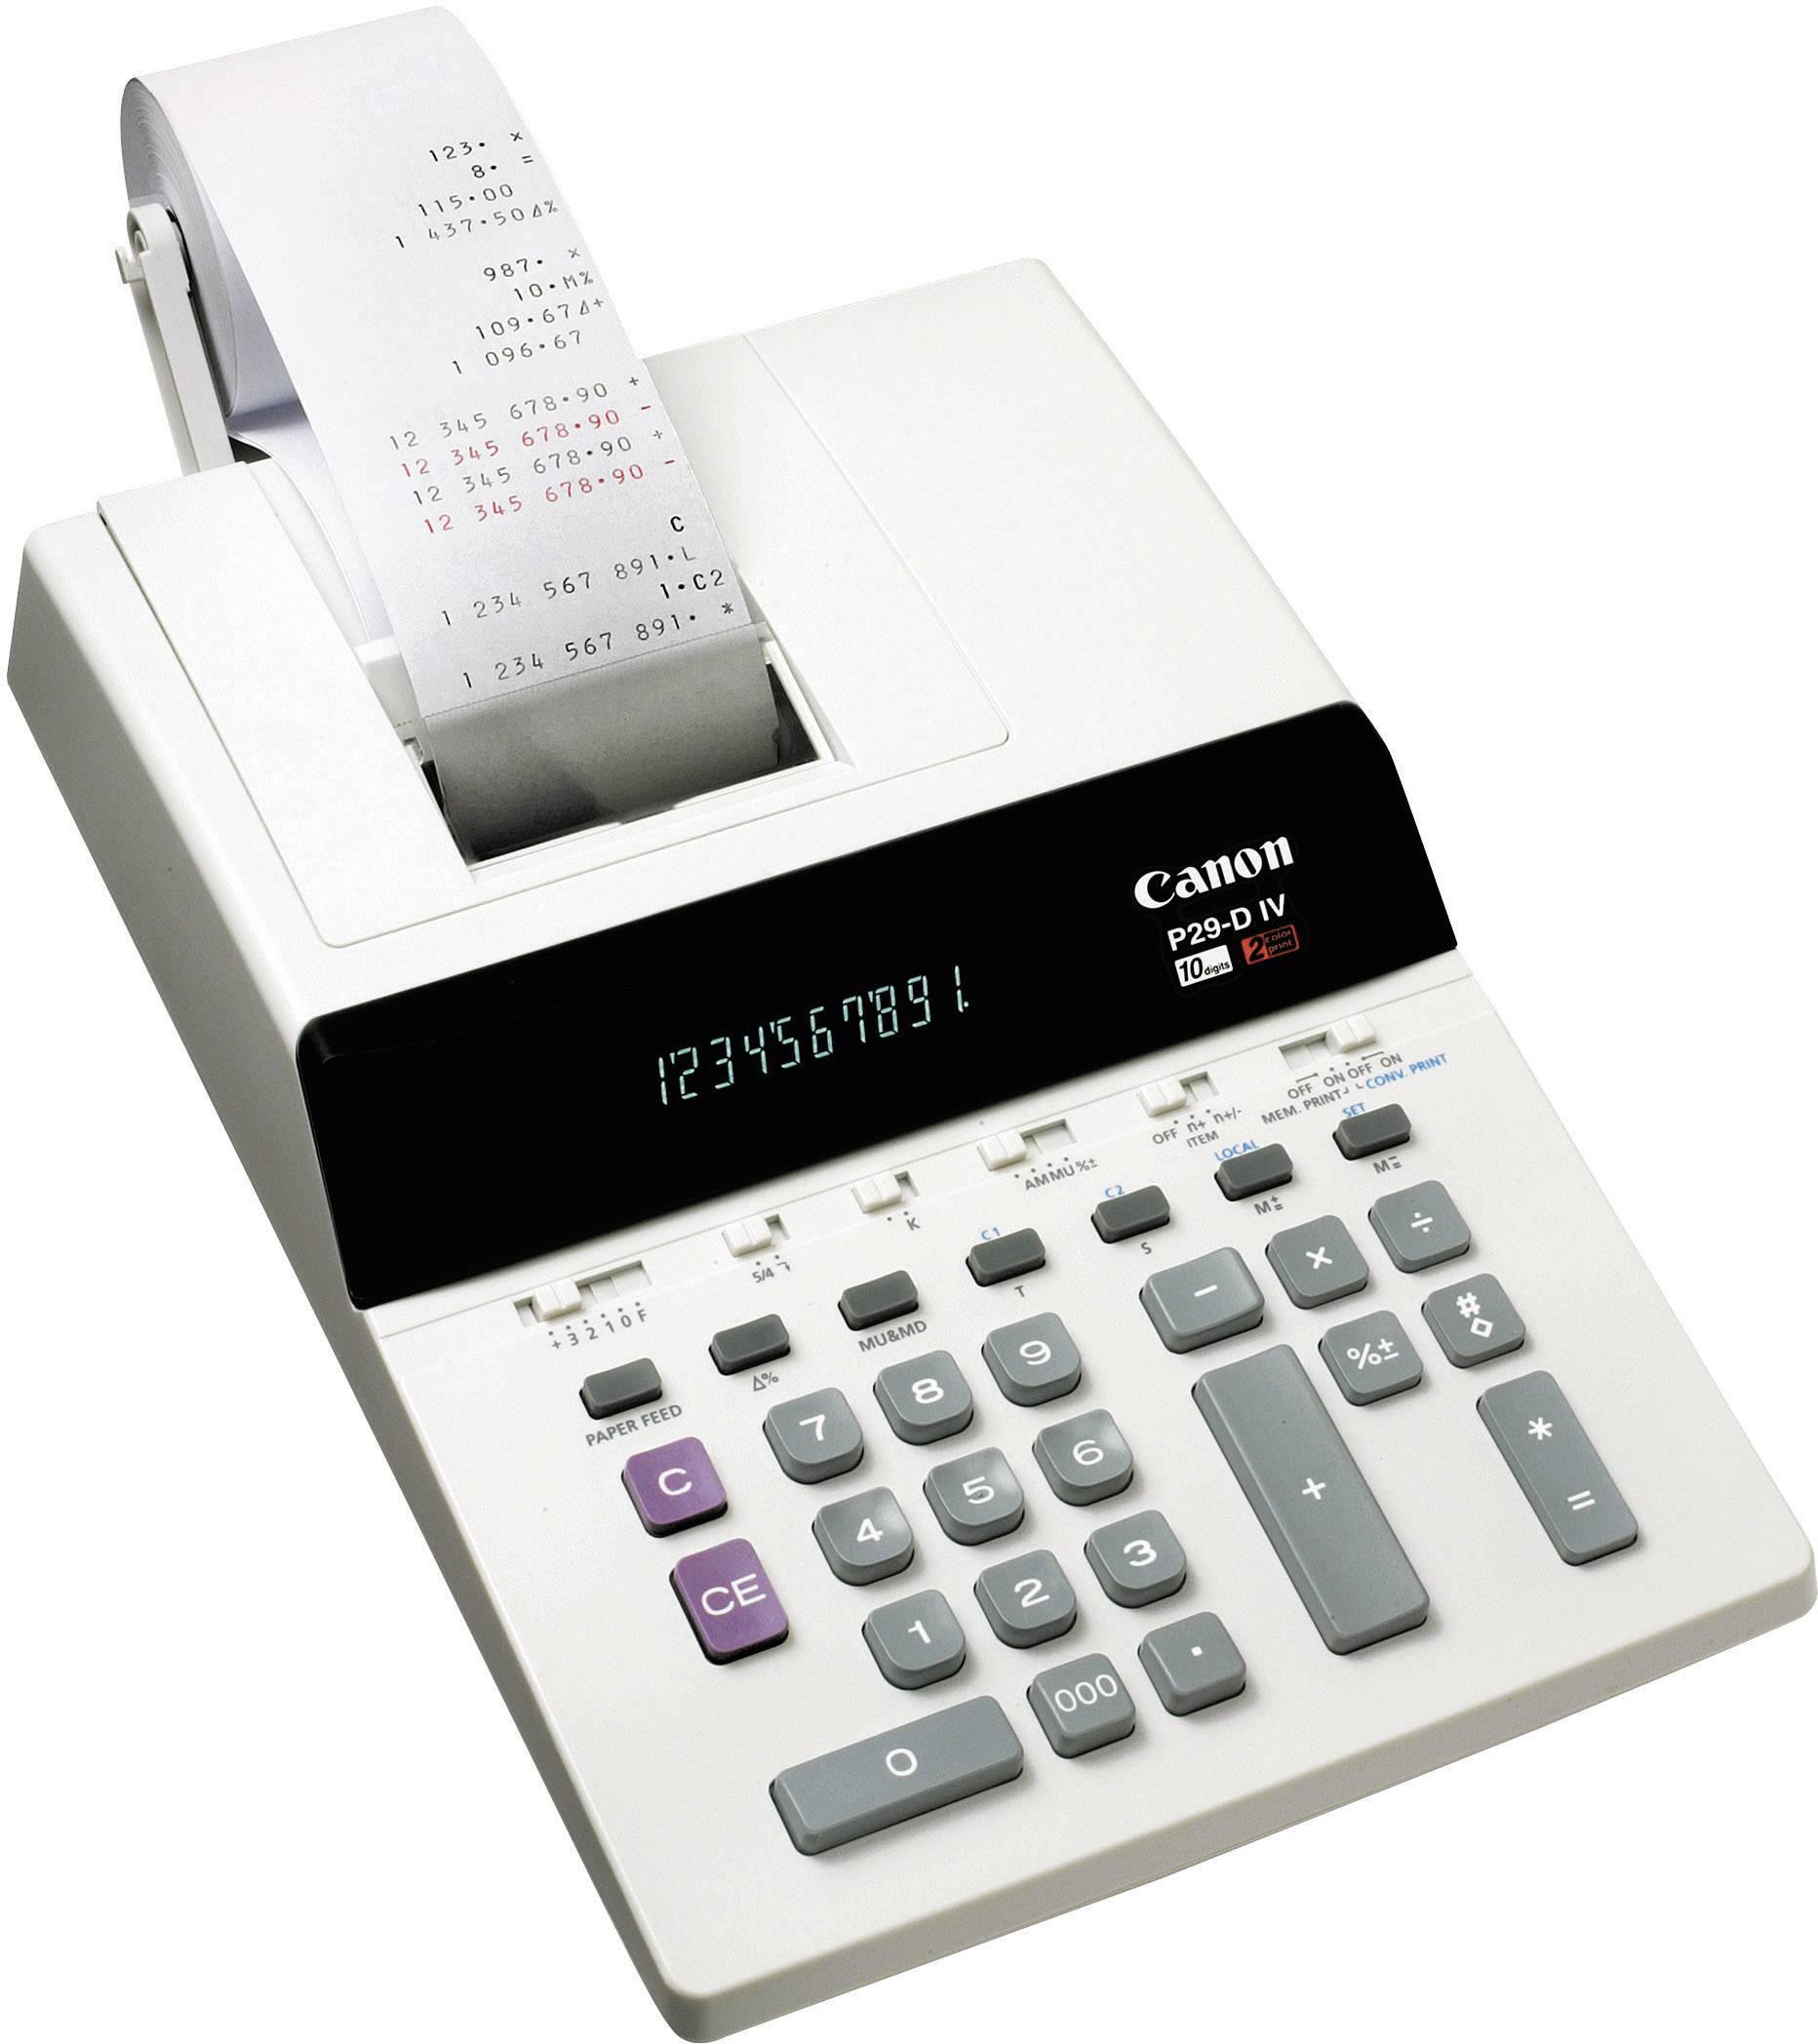 Stolní kalkulačka Sharp P29- D IV s tiskem